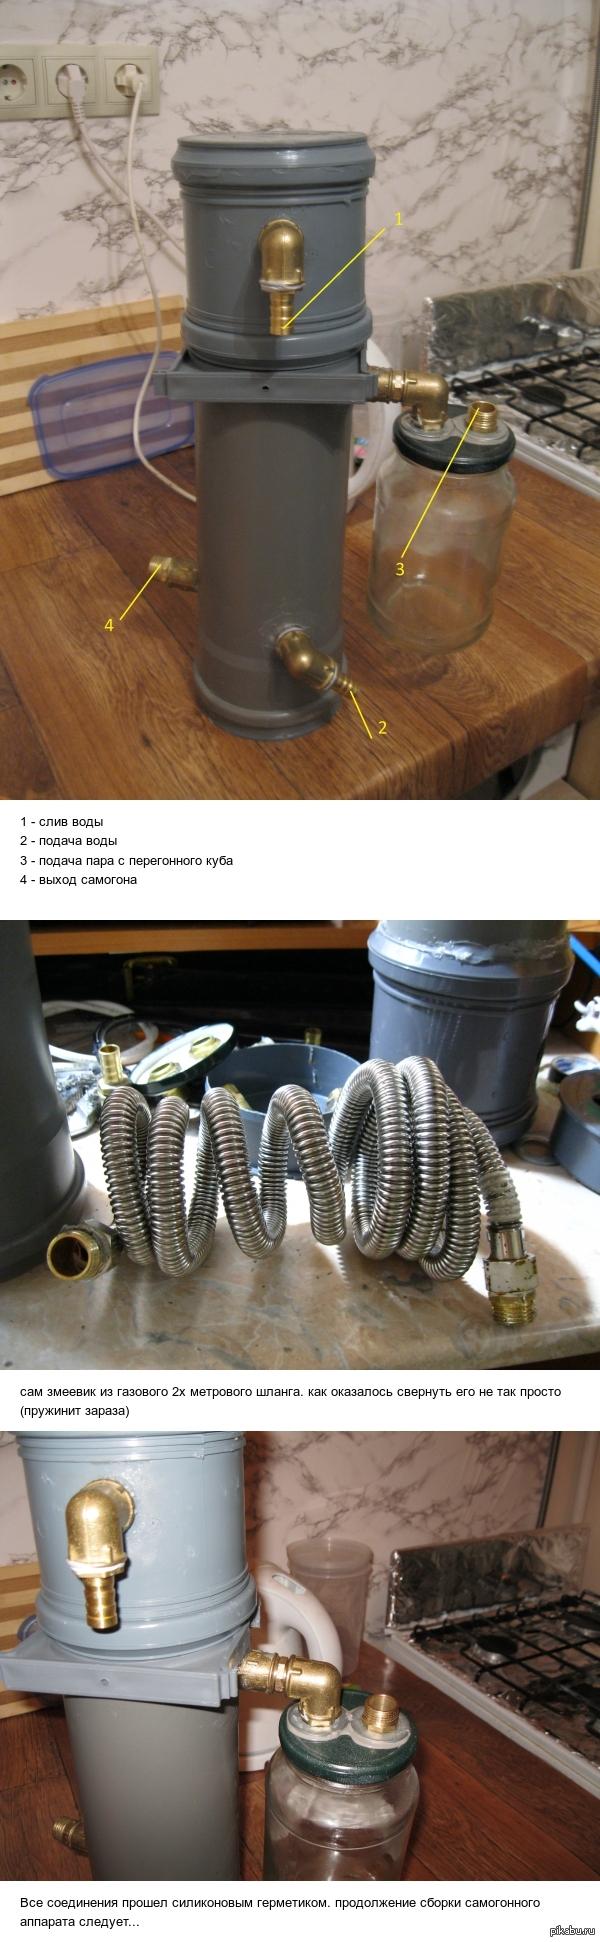 Самогонный аппарат диаметр трубки змеевика кто создал самогонный аппарат википедия